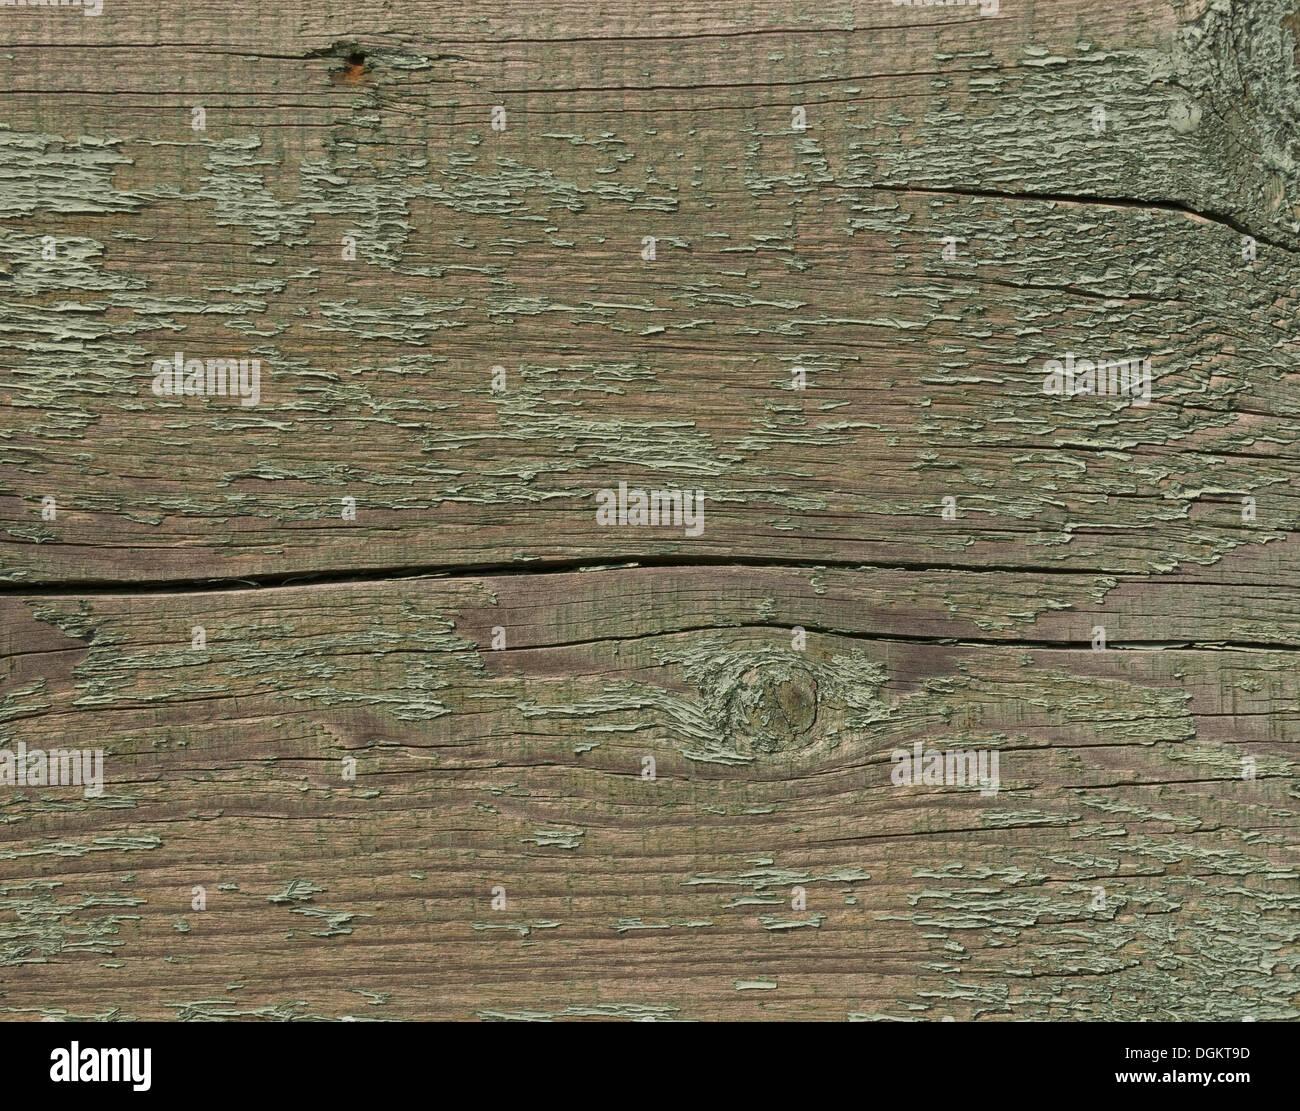 Weathered board, background - Stock Image